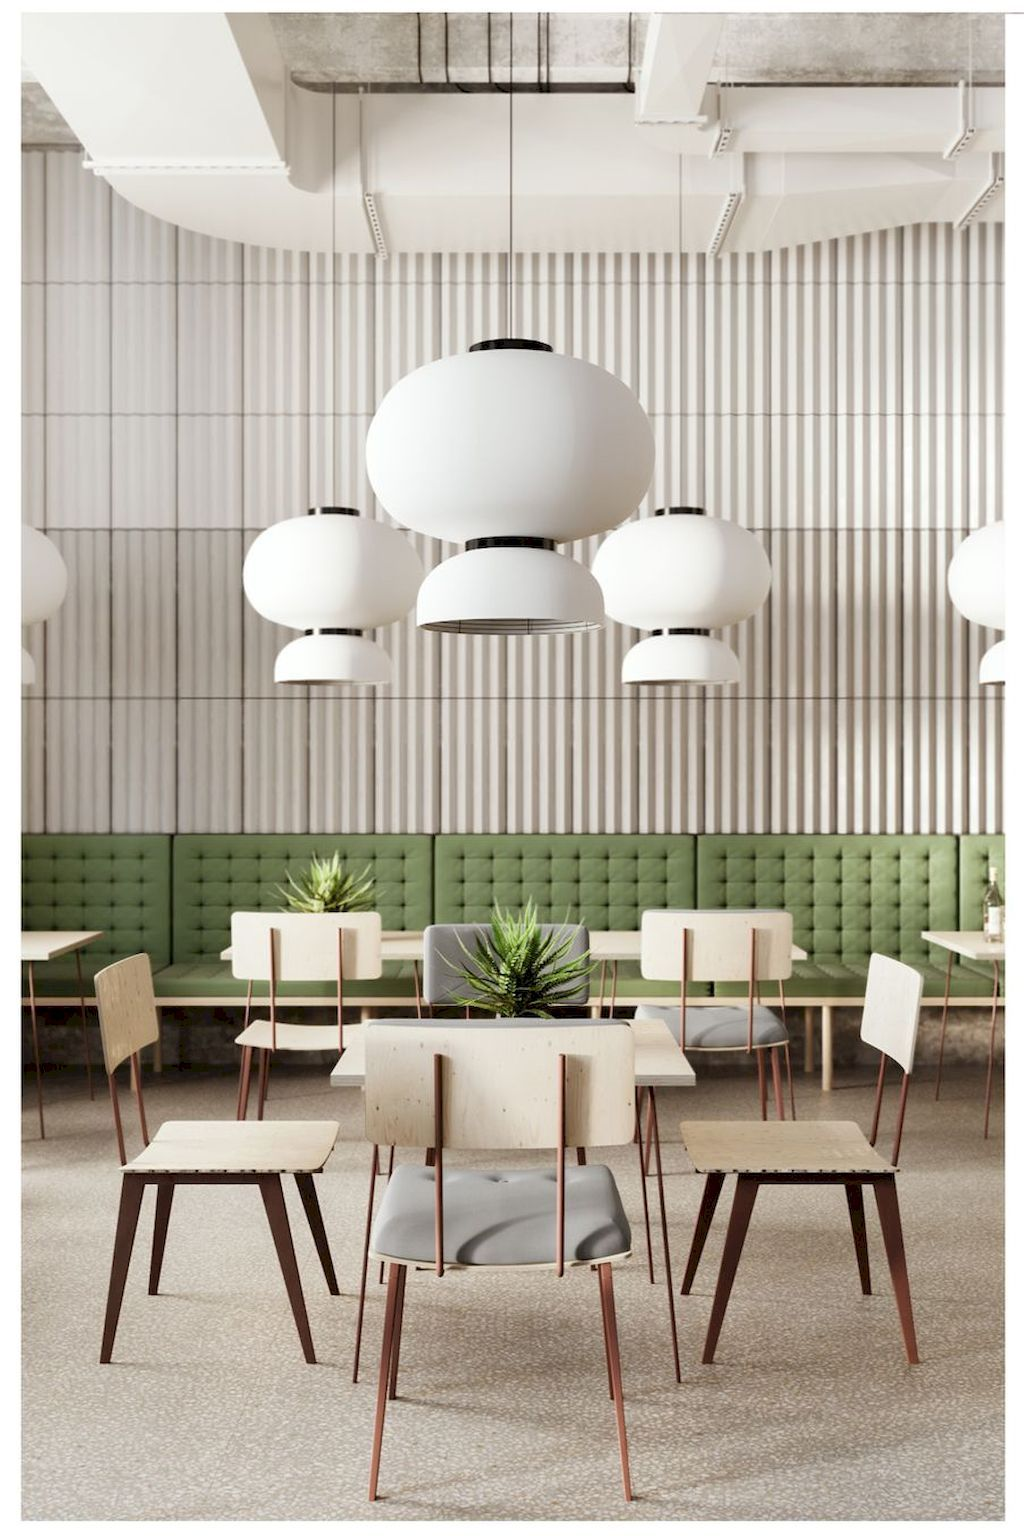 90 Dreamiest Scandinavian Dining Room Design Ideas Scandinavian Dining Room Luxury Restaurant Interior Cafe Interior Design